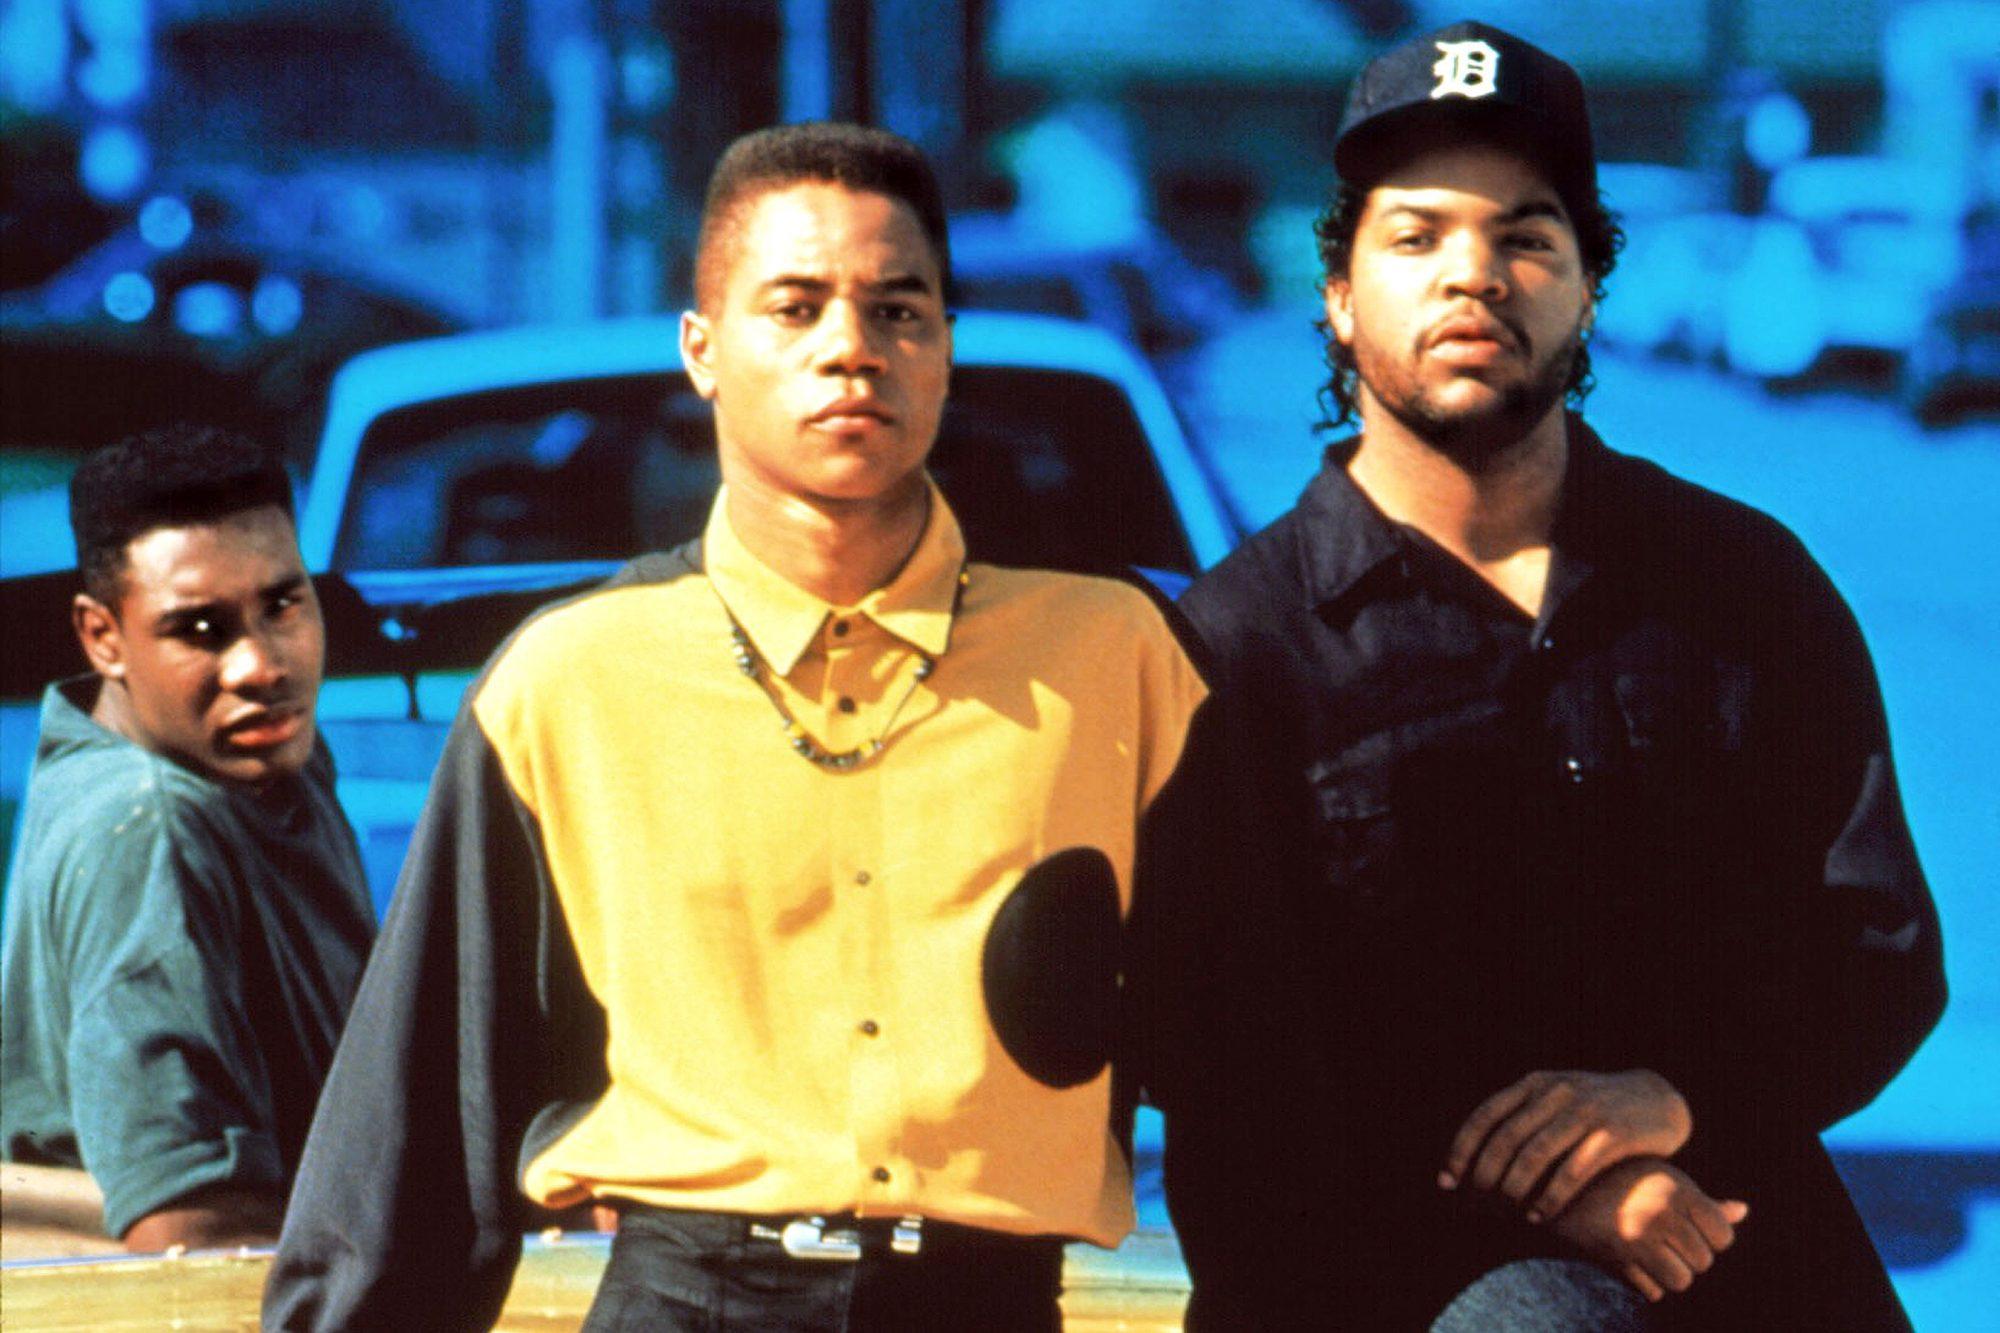 BOYZ N THE HOOD, Morris Chestnut, Cuba Gooding Jr., Ice Cube (aka O'Shea Jackson), 1991